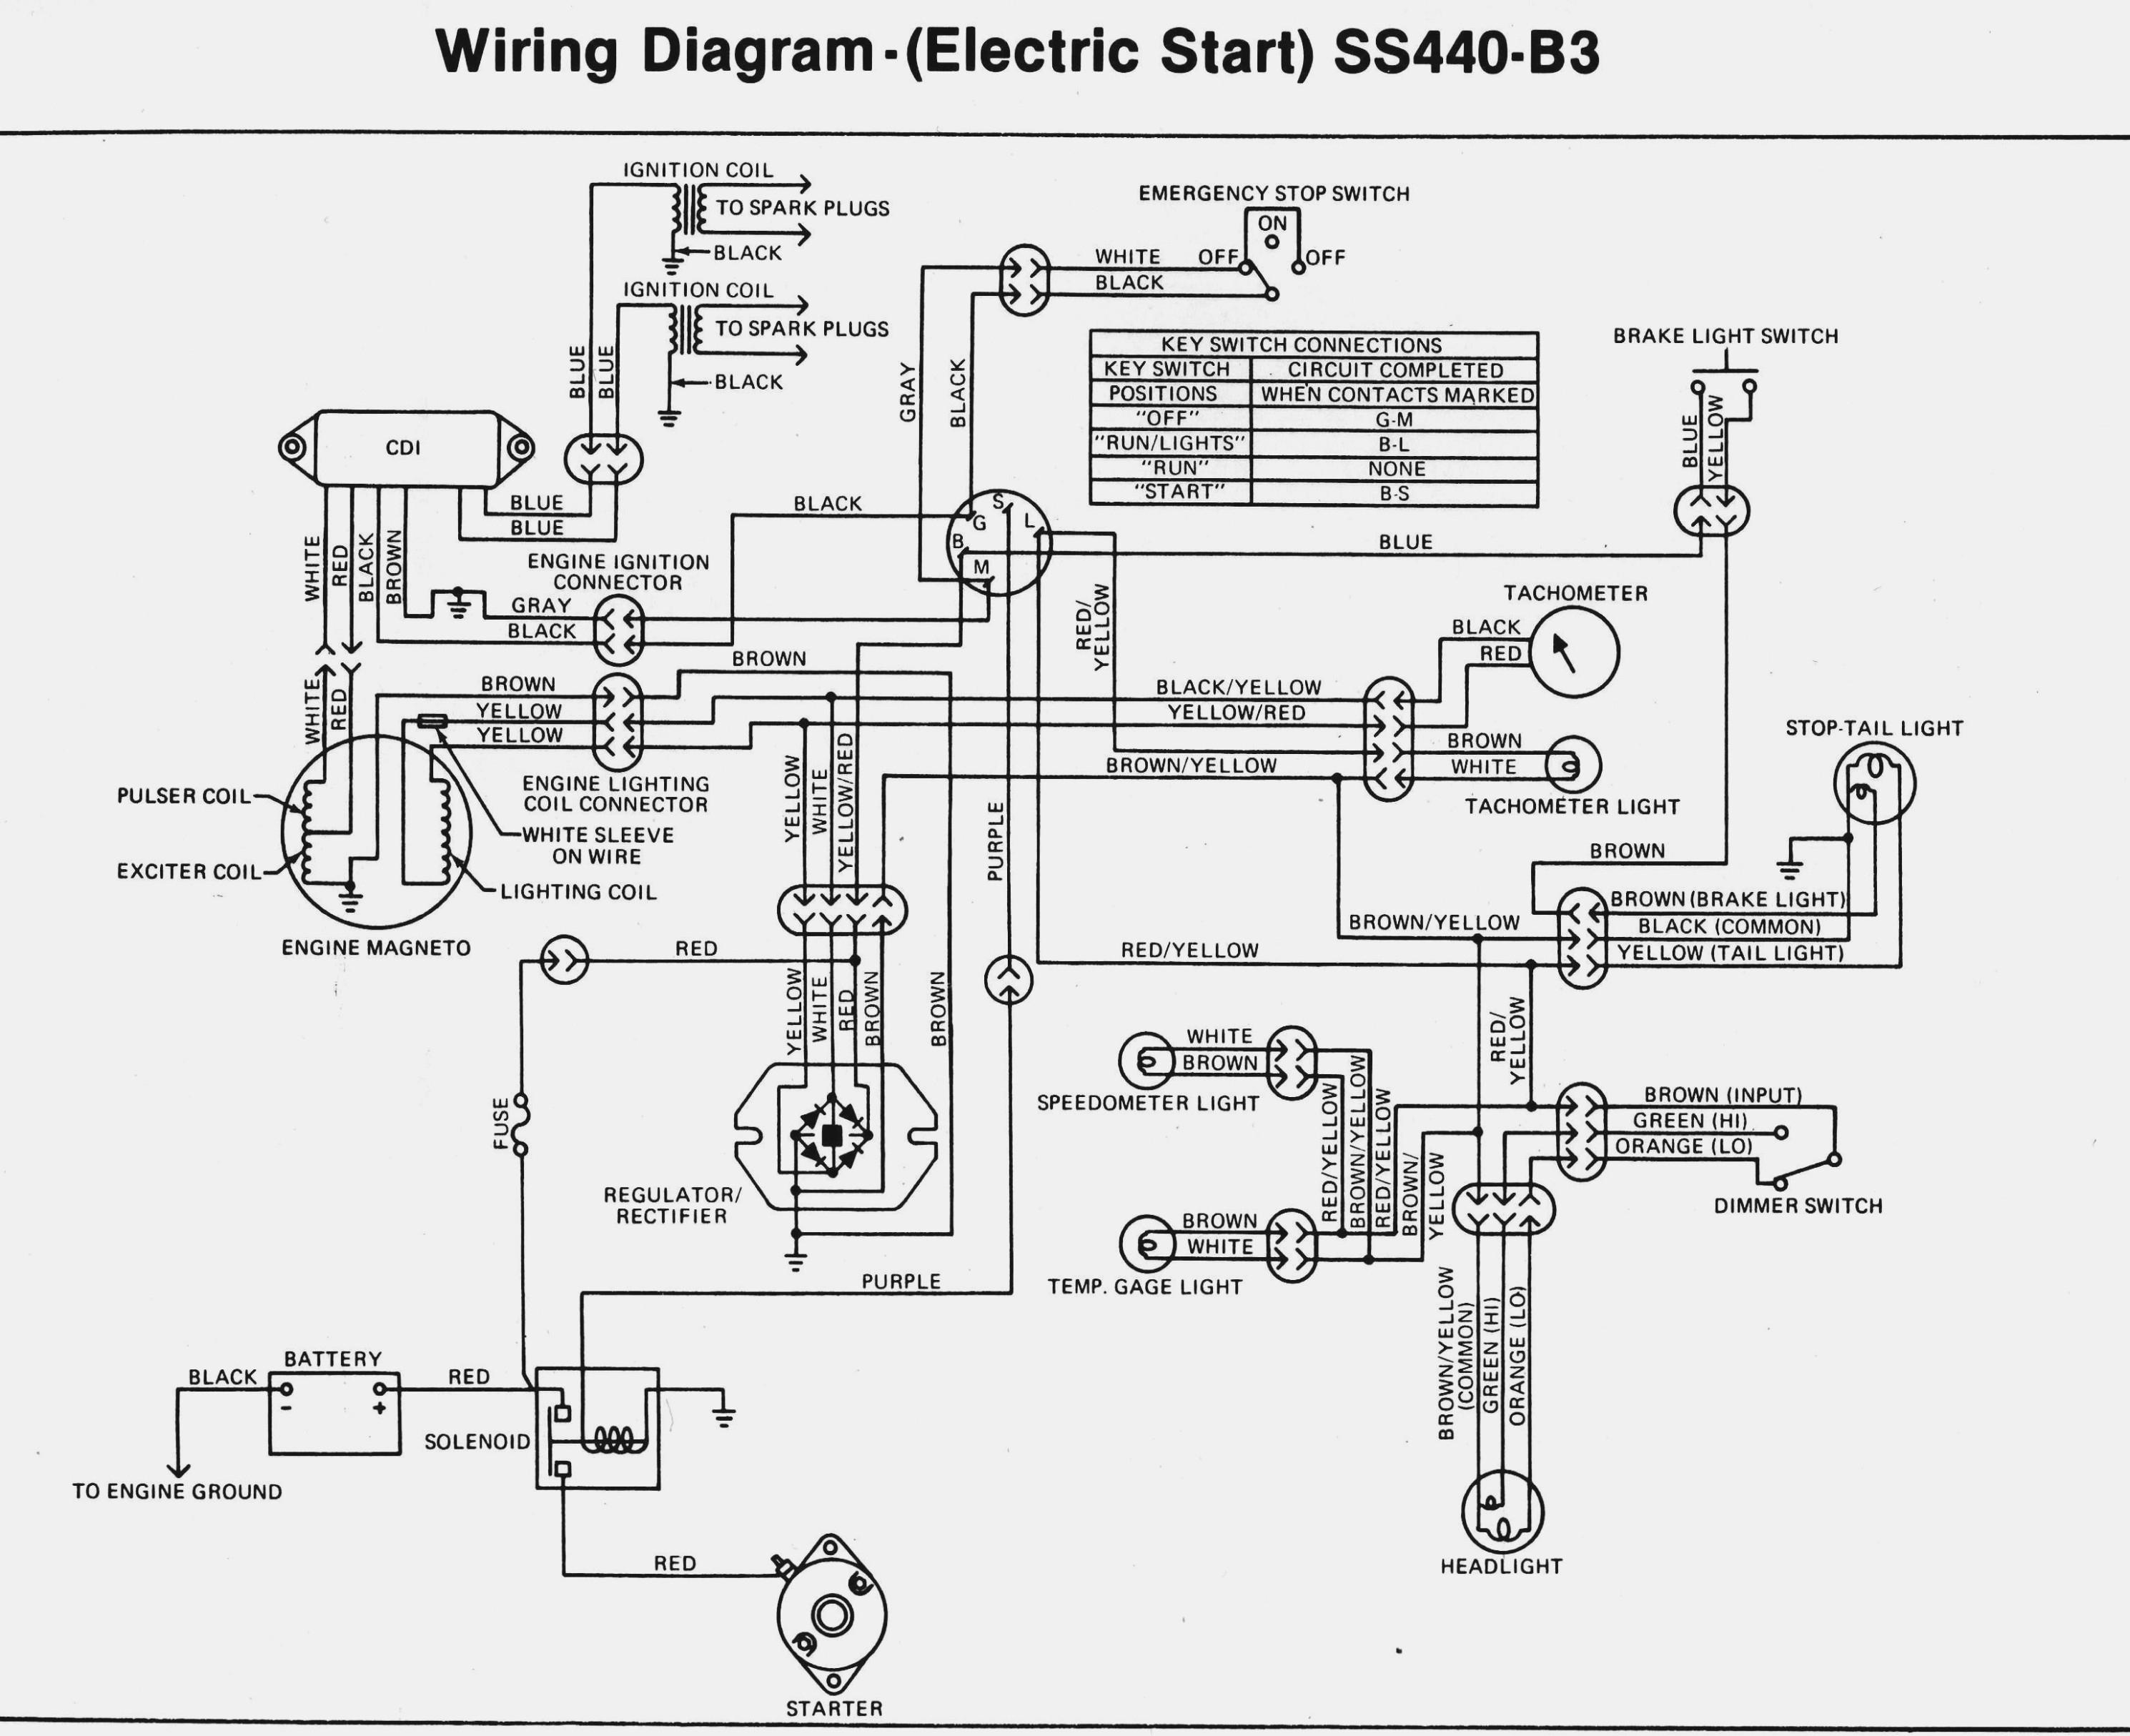 Gx390 Wiring Diagram - Wiring Diagram Data - Honda Gx390 Wiring Diagram